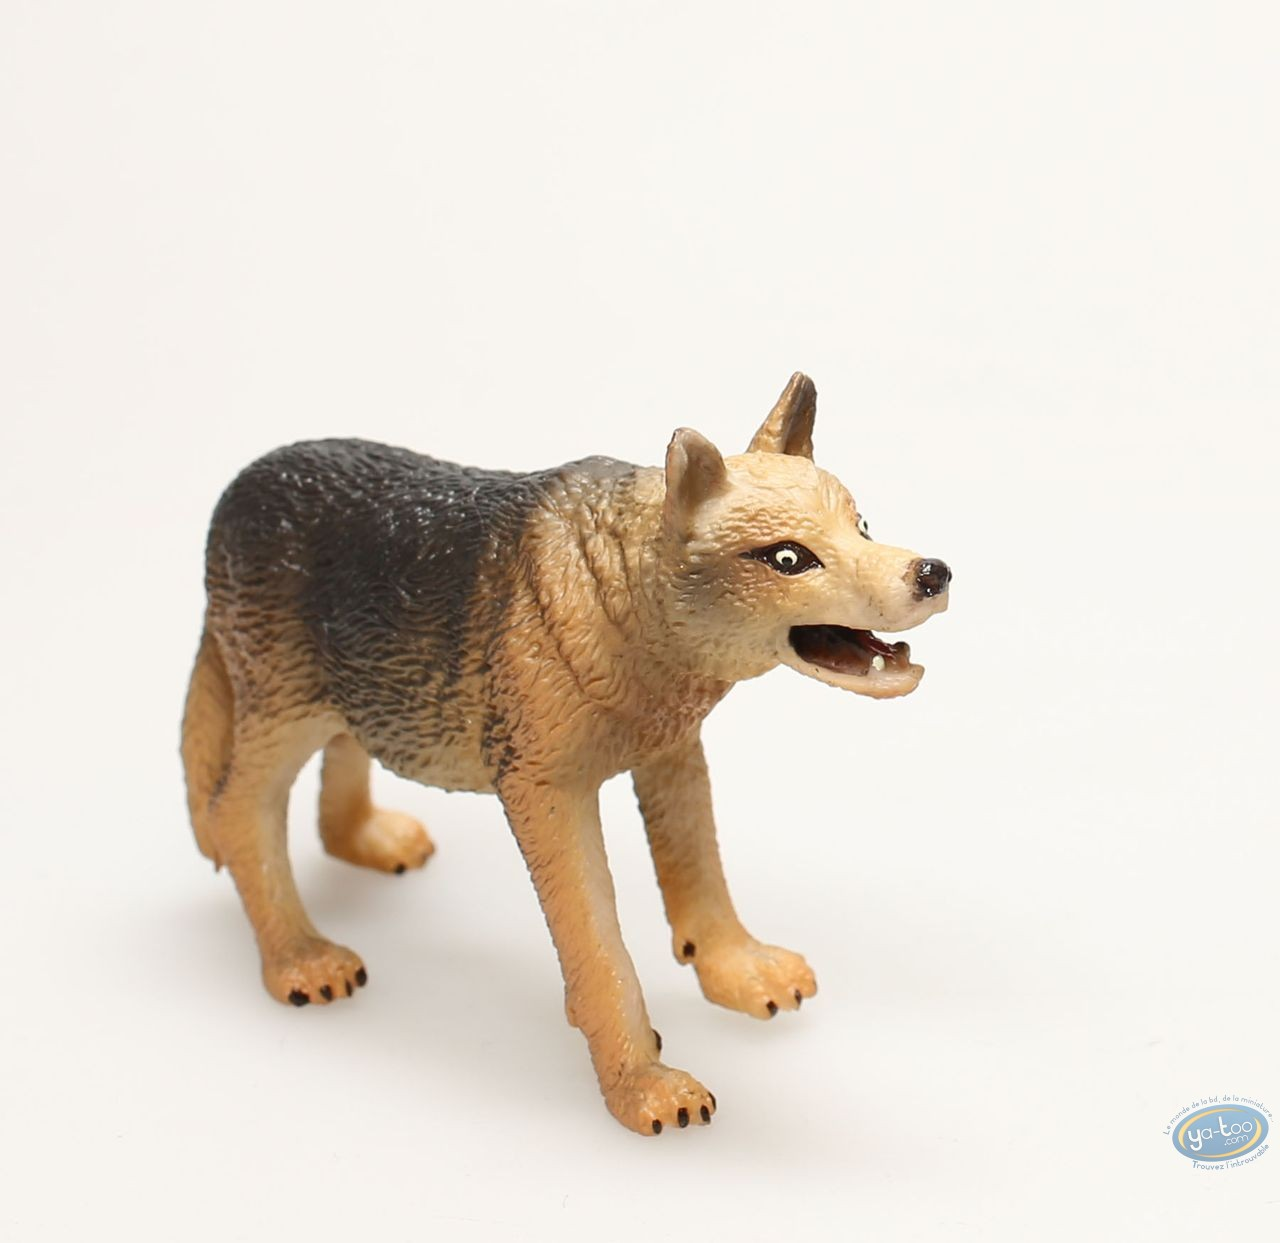 Figurine plastique, Animaux : Loup